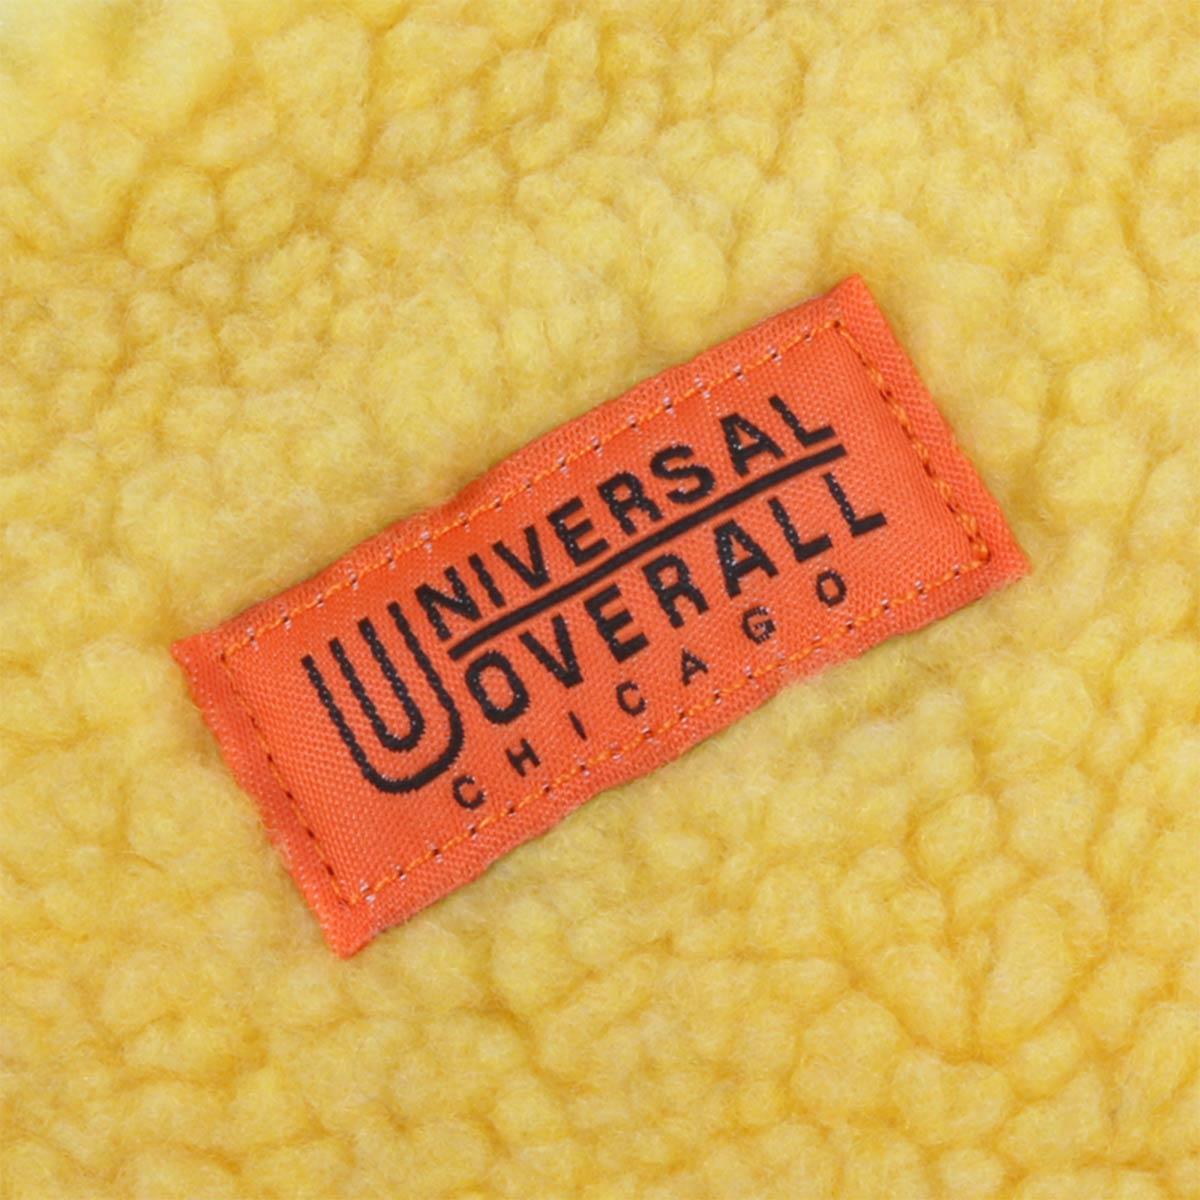 UNIVERSAL OVERALL ユニバーサルオーバーオール ボアサコッシュ